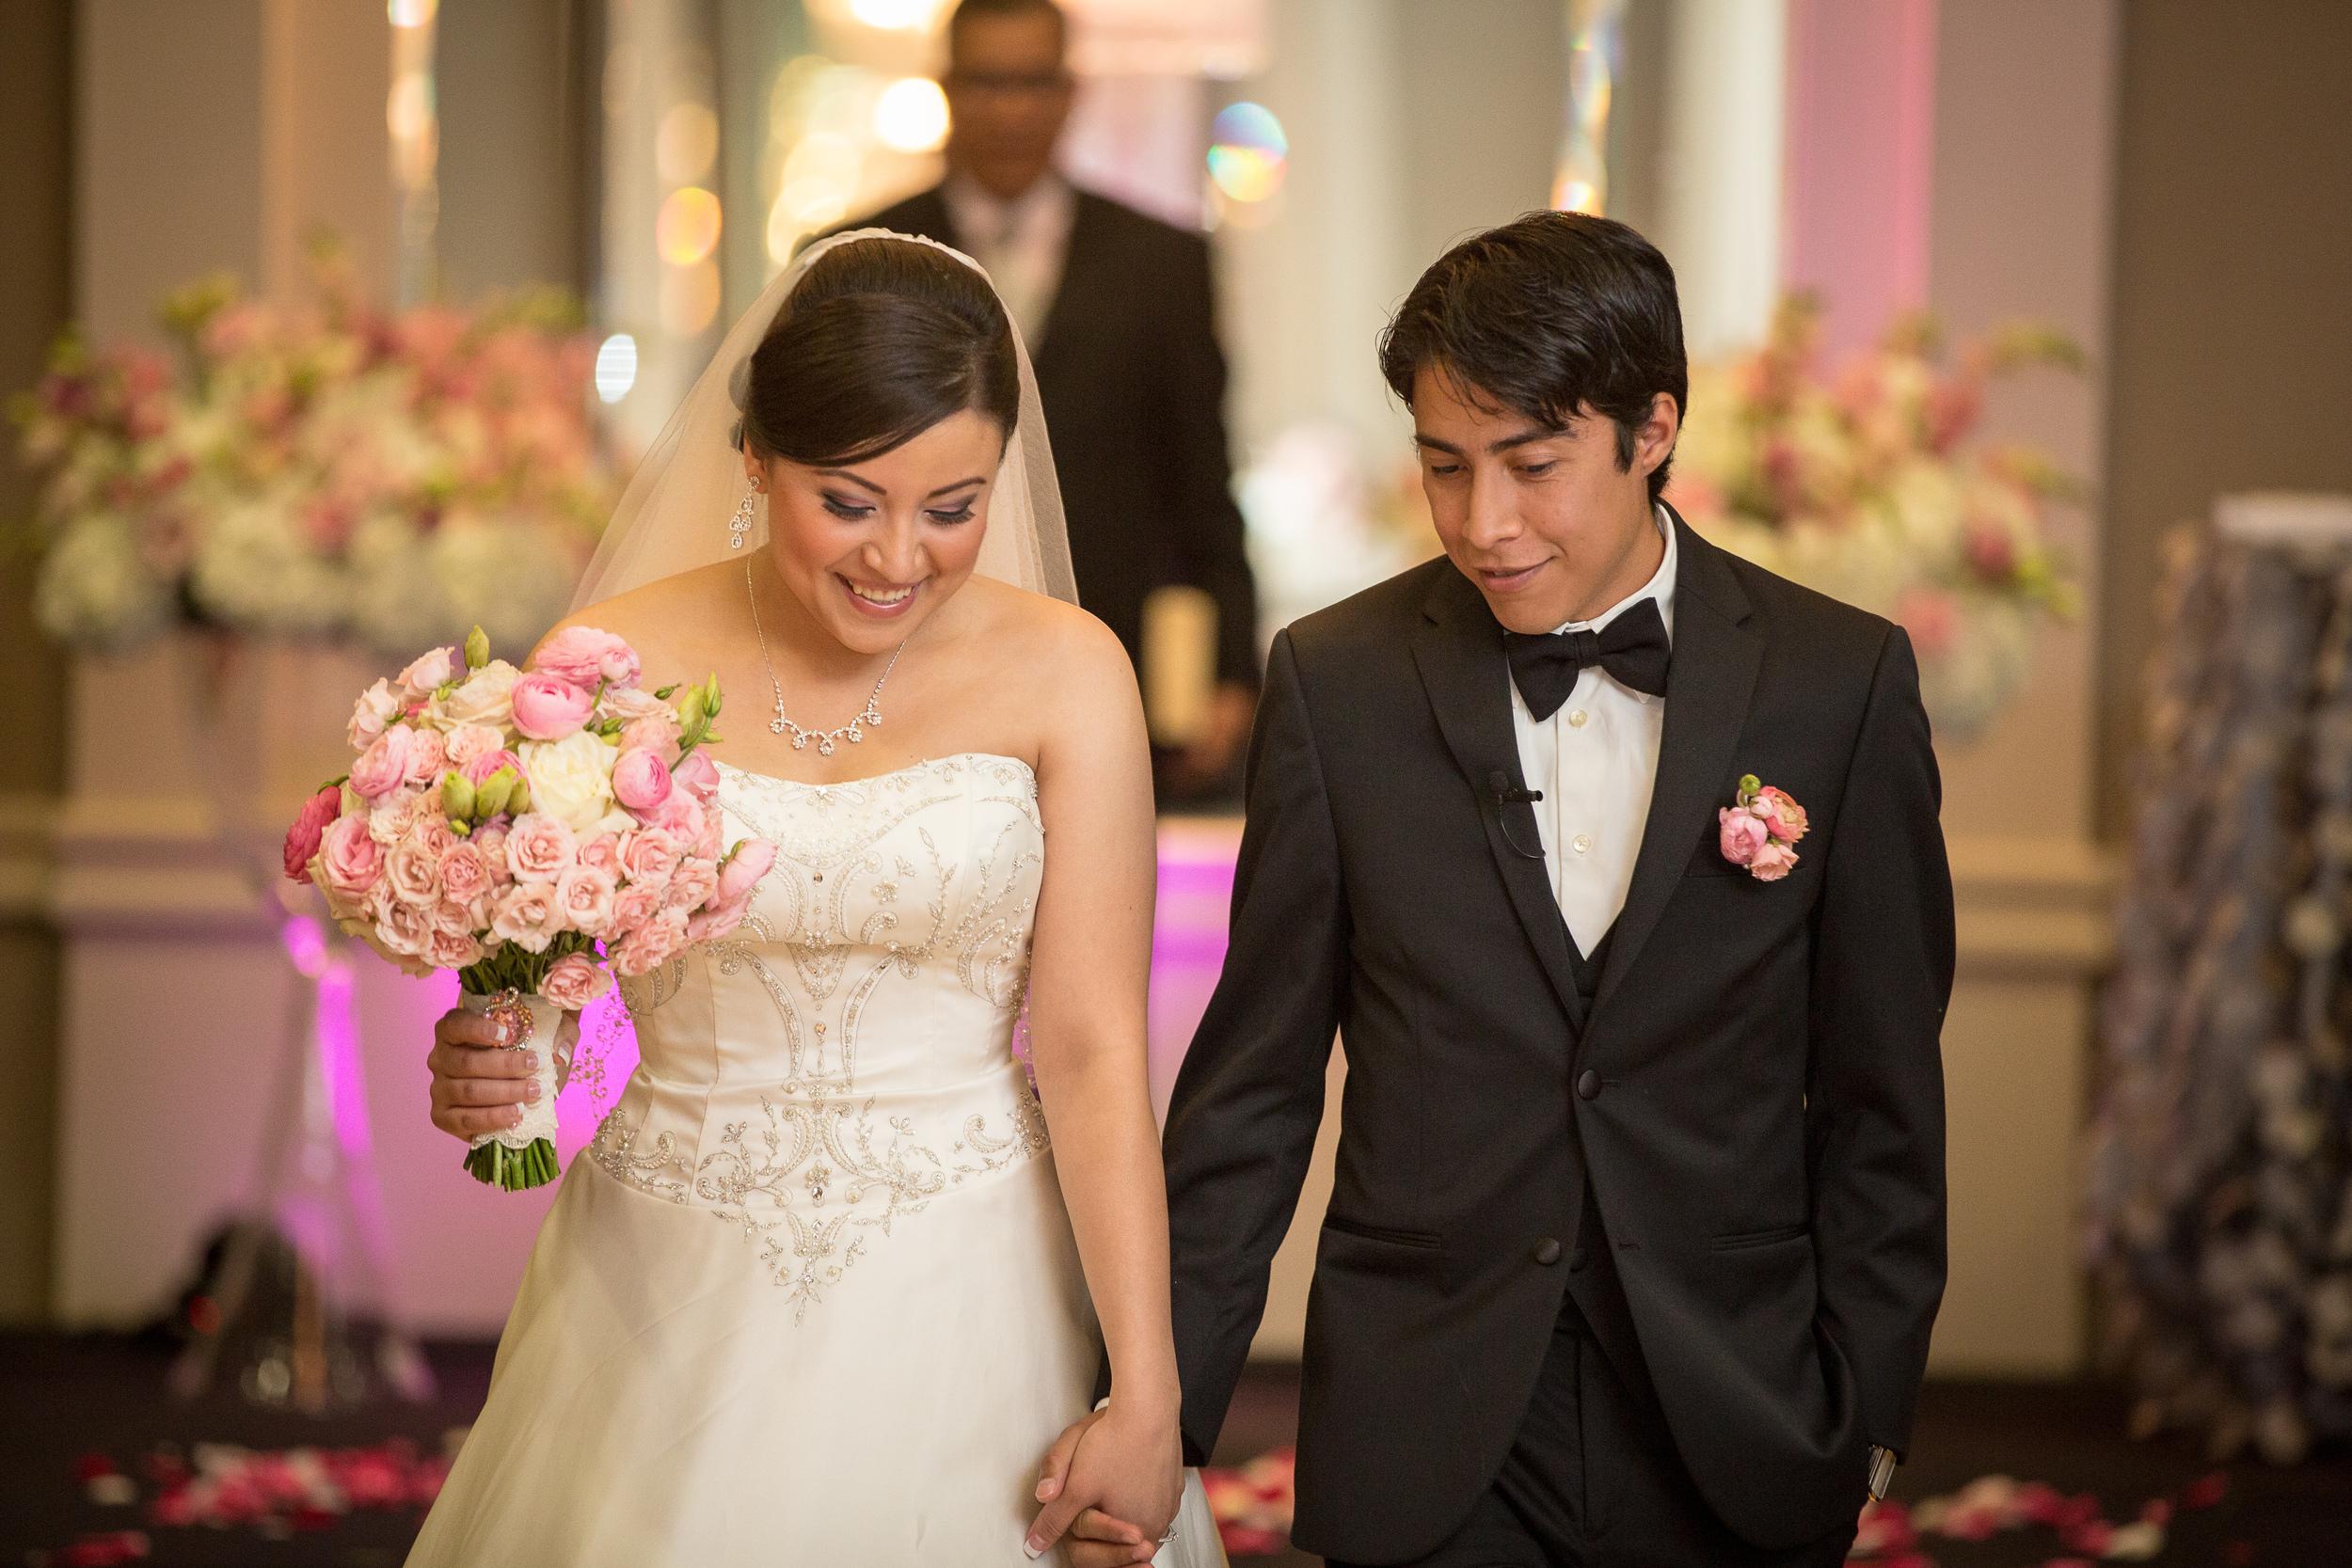 Vanessa - Houston Wedding Photography (4)